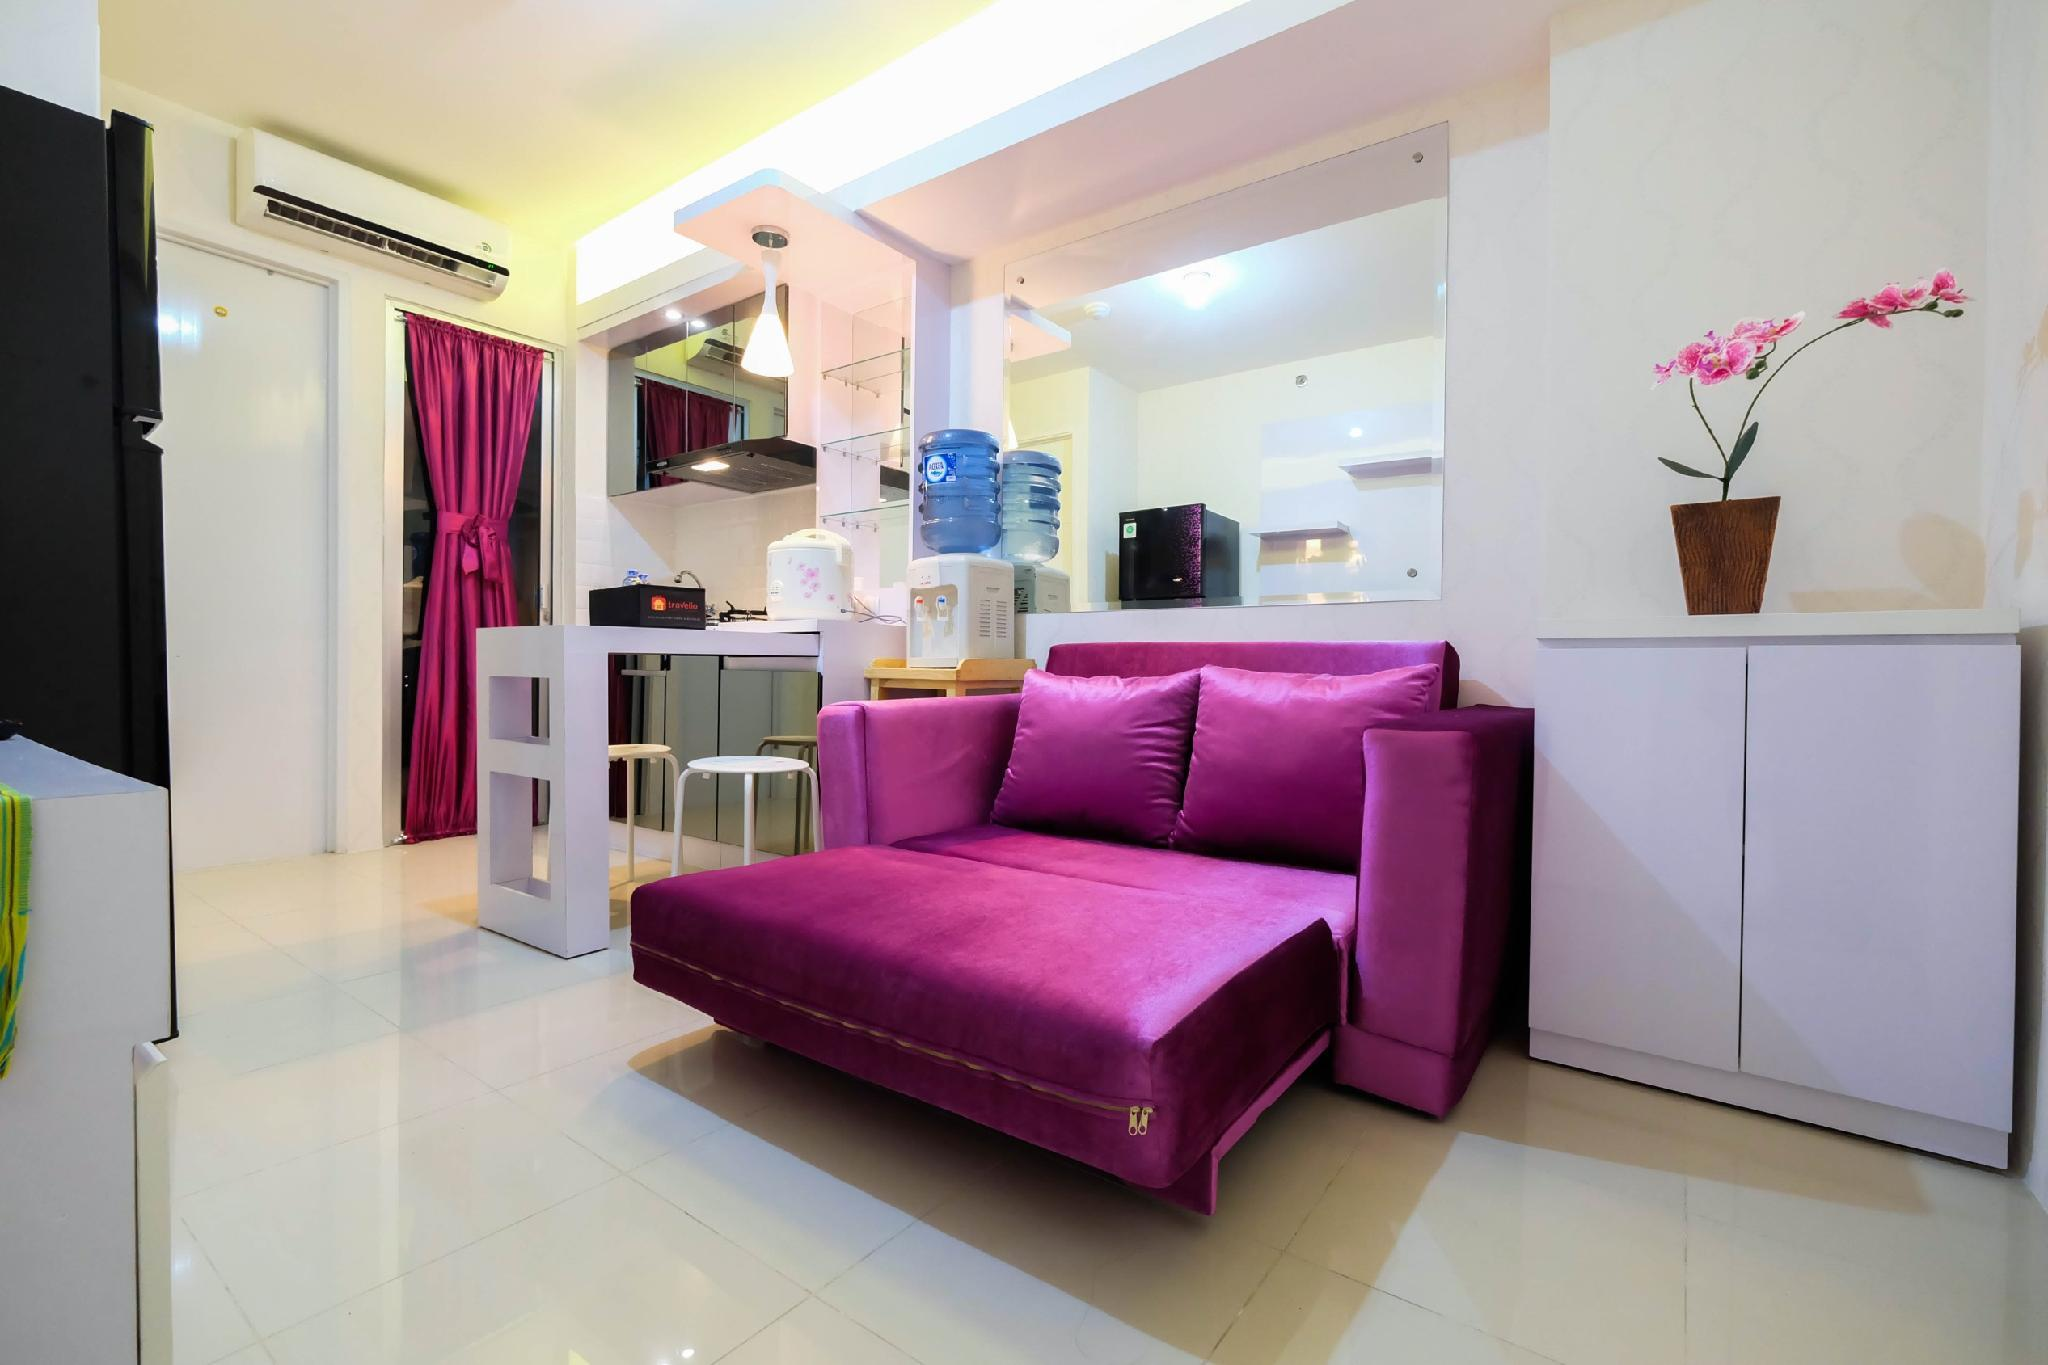 Comfy 2BR Bassura City Apt Near Mall By Travelio